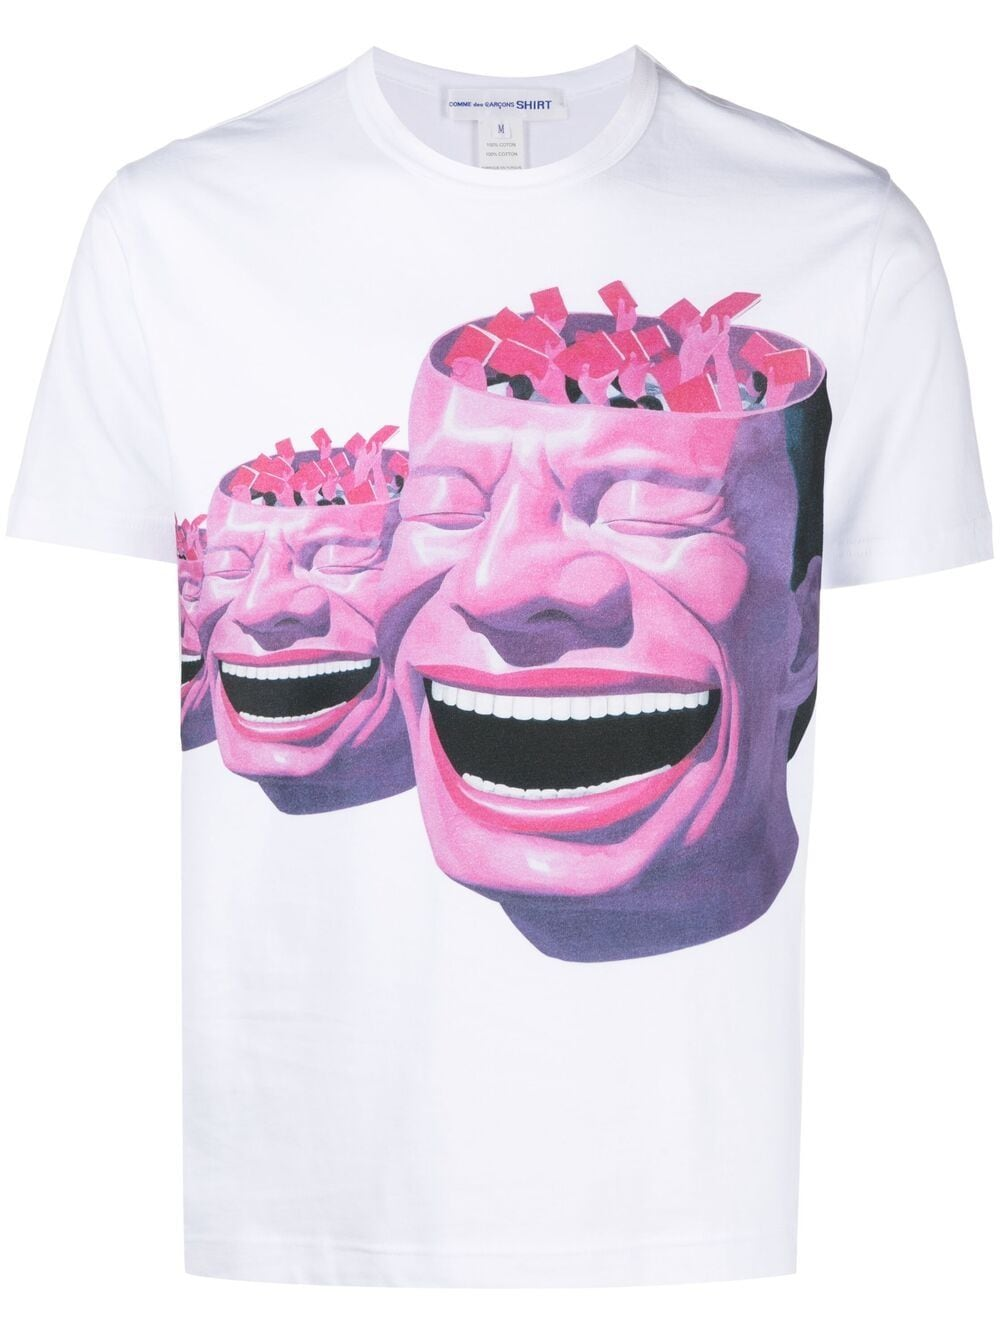 Comme Des Garçons Shirt t-shirt uomo bianco COMME DES GARÇONS SHIRT | T-shirt | FG-T003WHITE/PRINTE